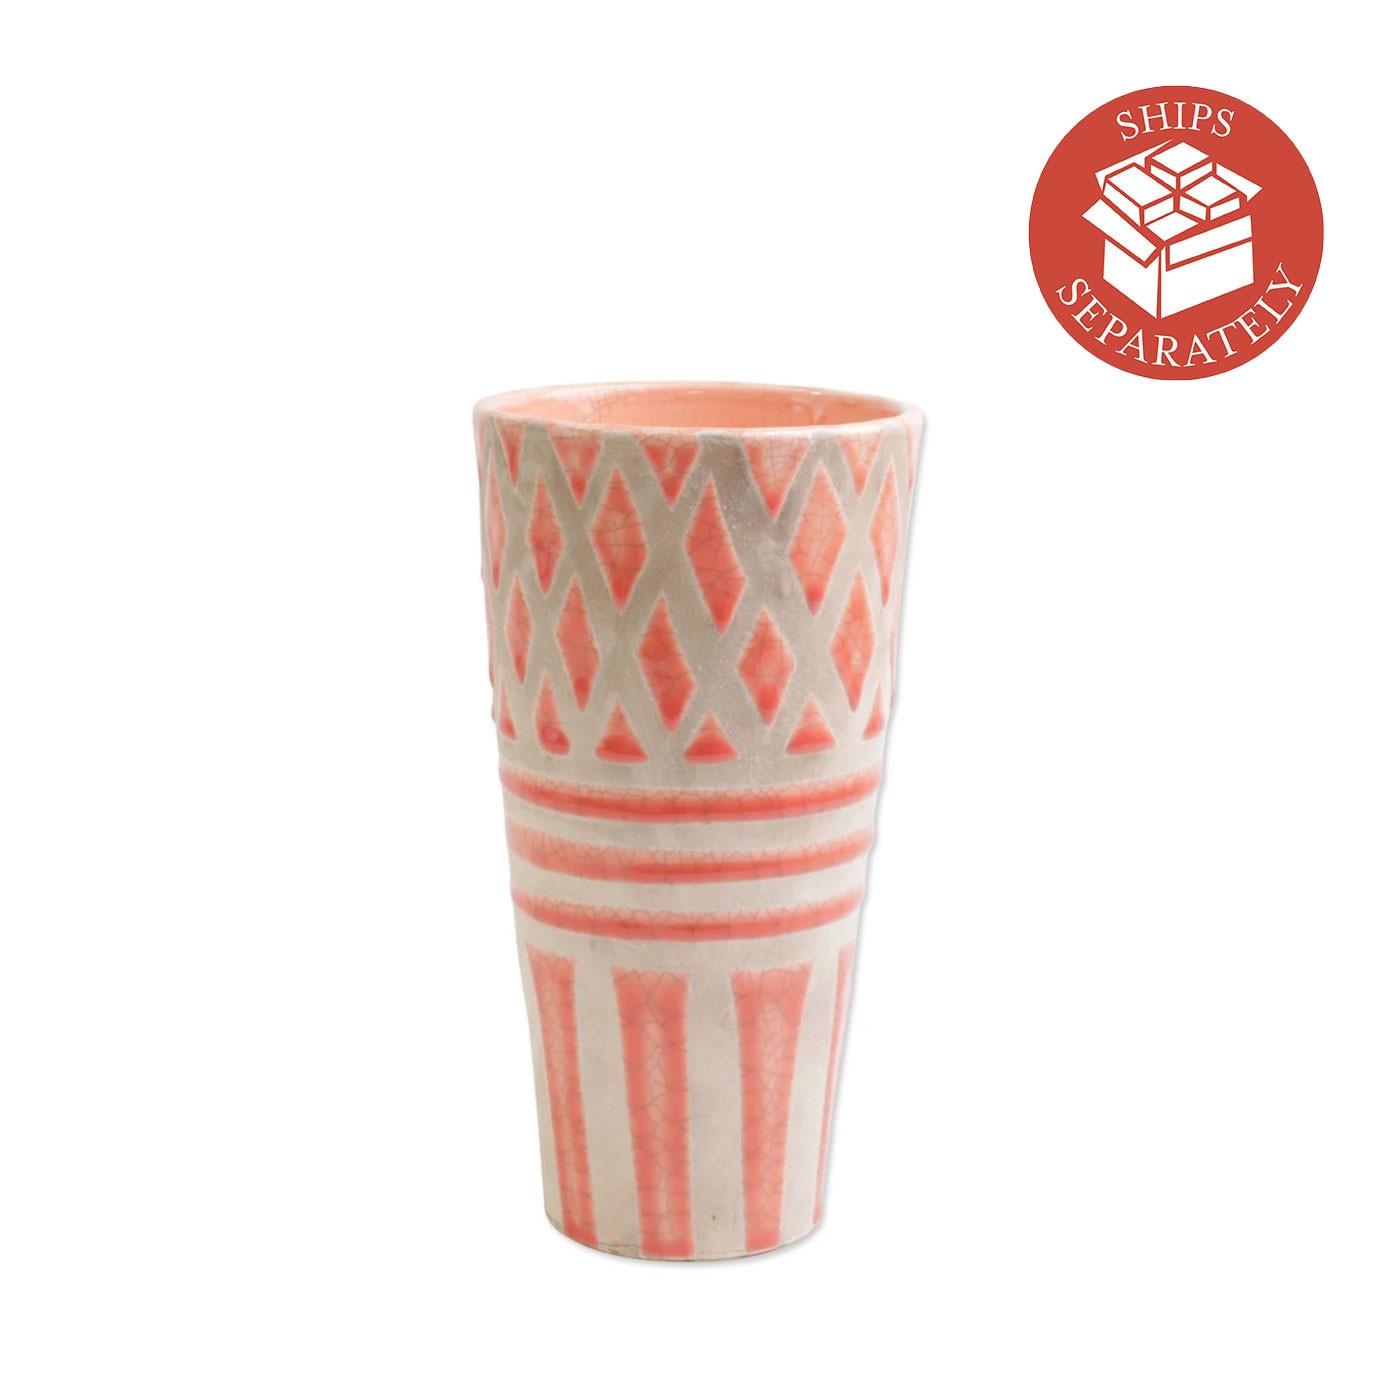 Garden Geo Coral Tall Vase - Vietri | Eataly.com